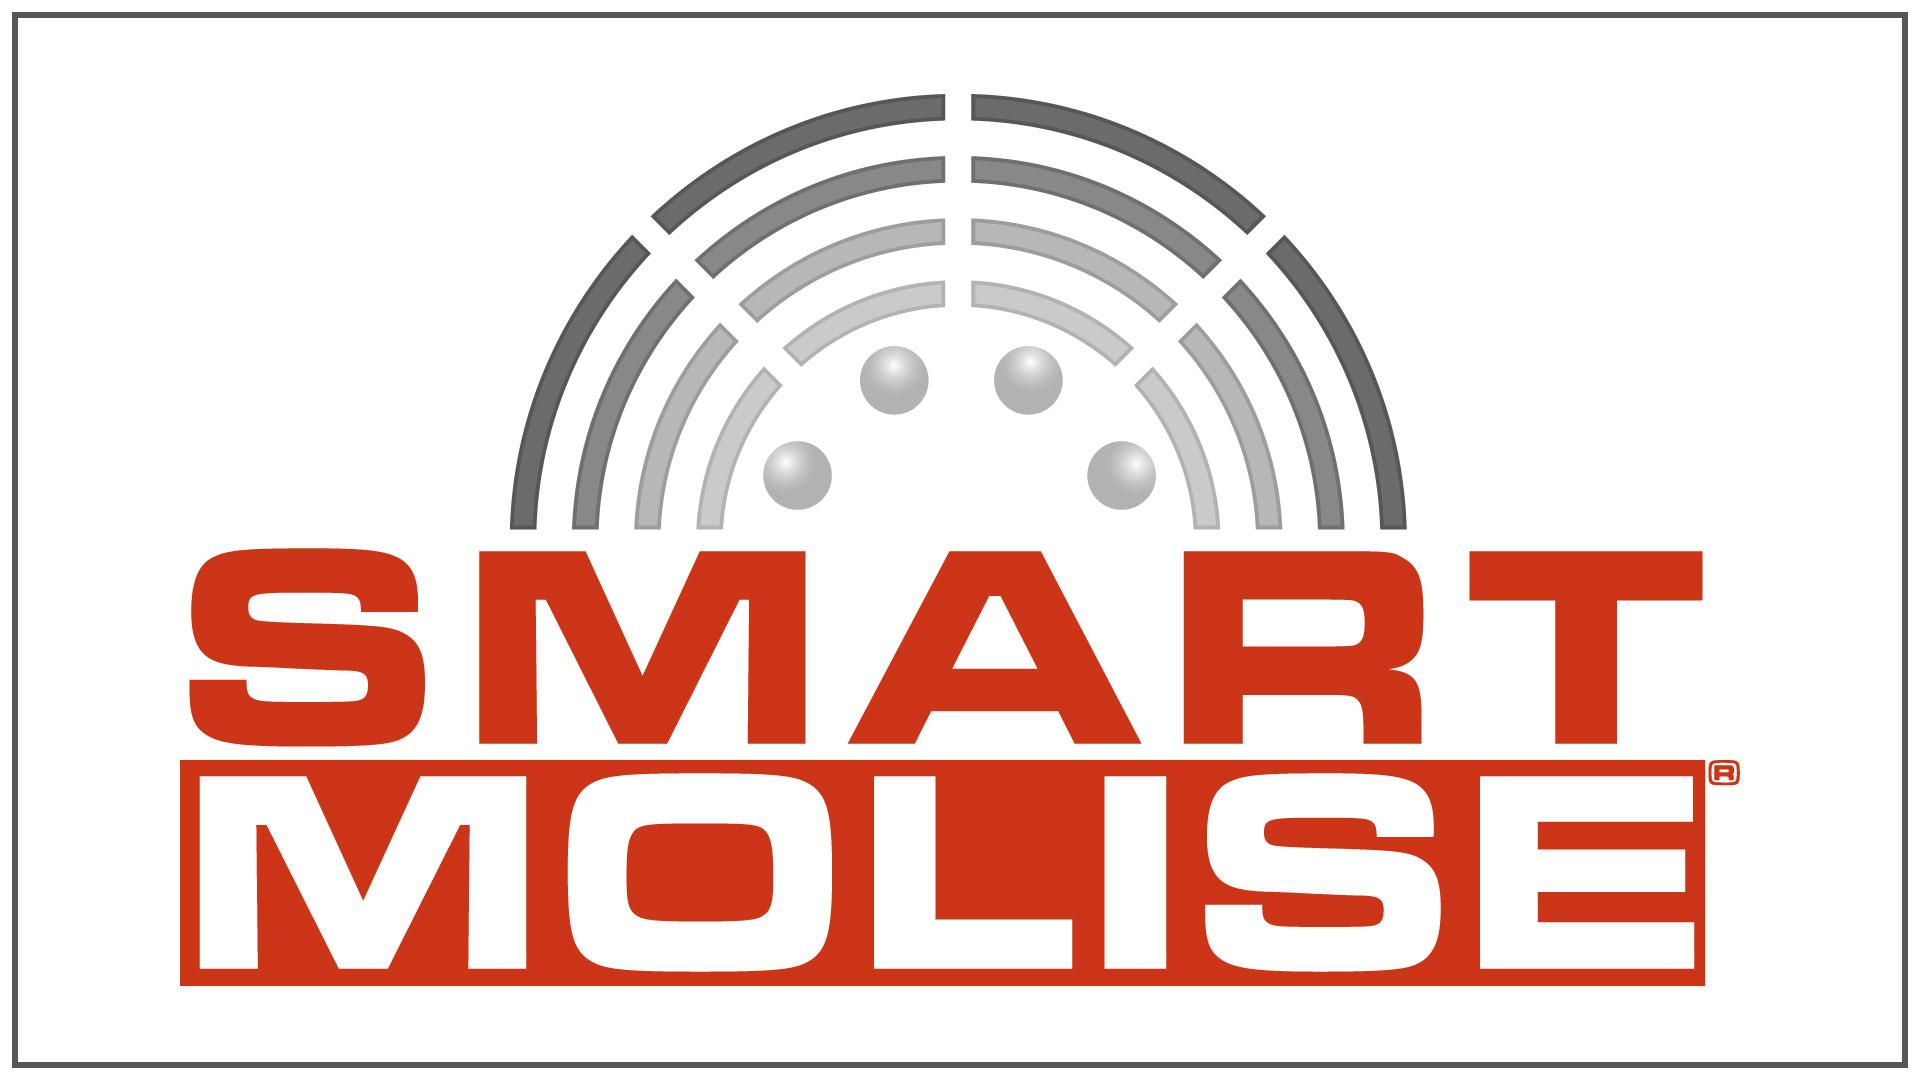 promediart_portfolio_logo-design_SMART-MOLISE